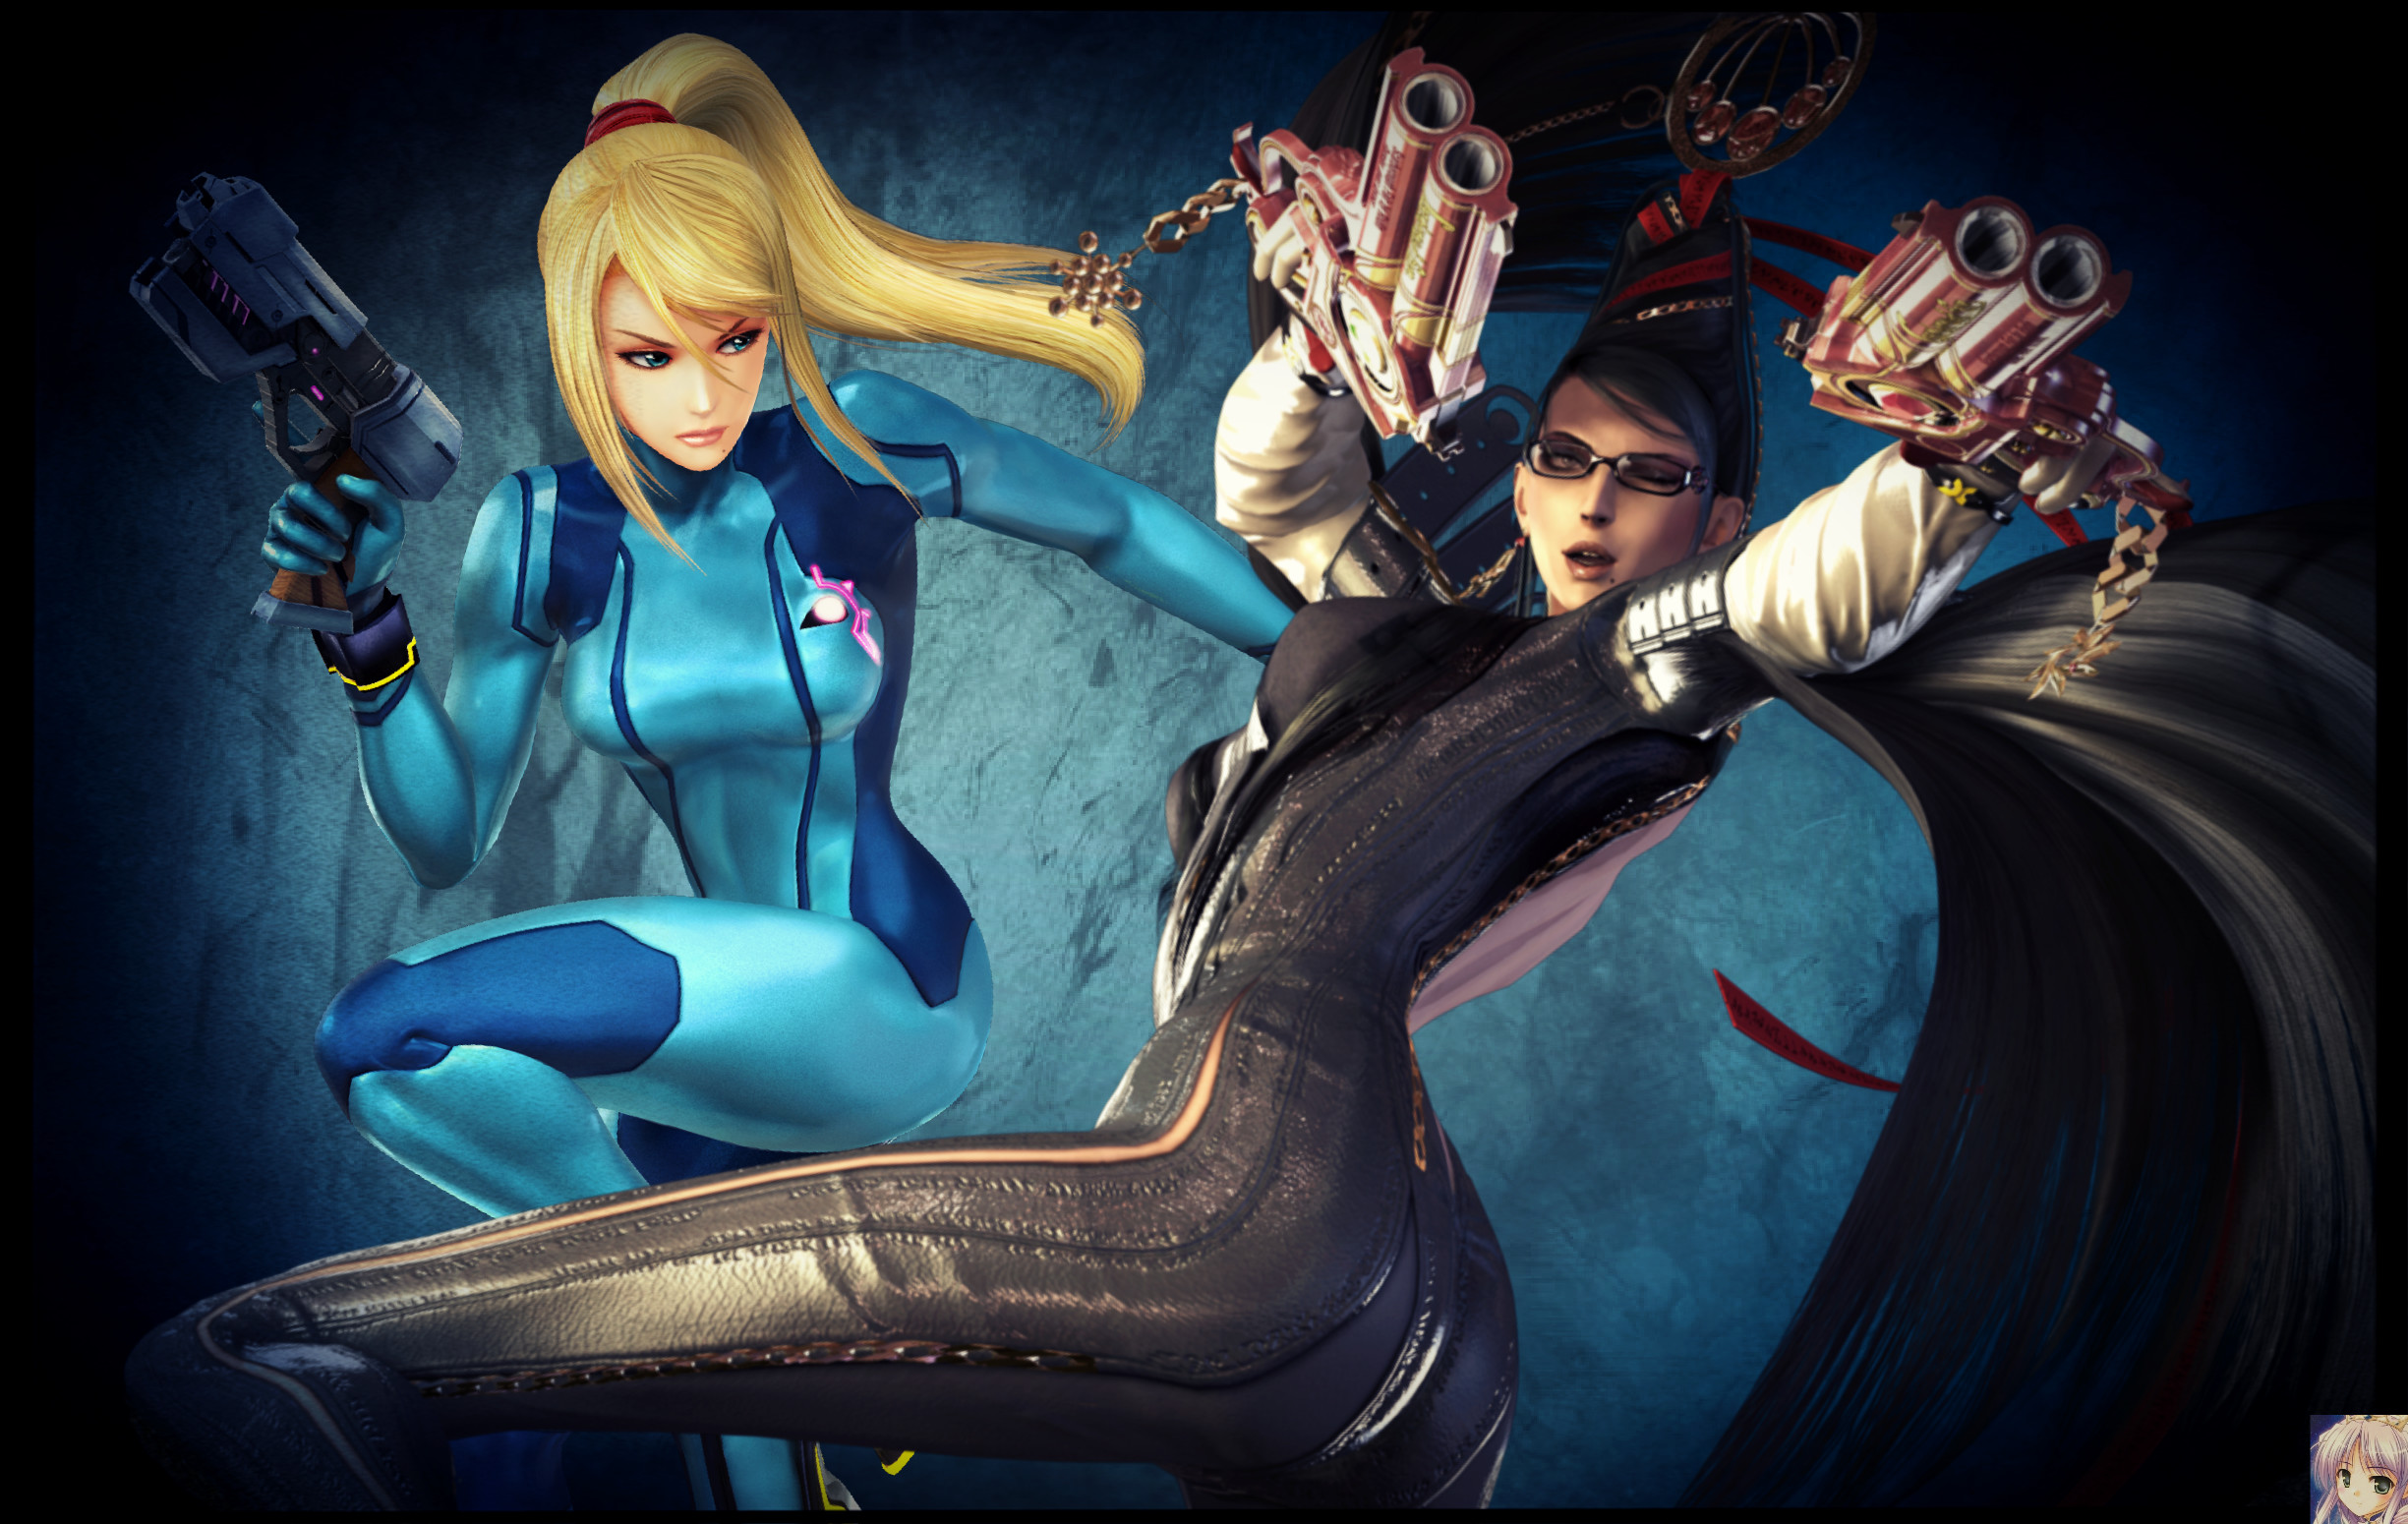 … Samus Aran/Zero Suit and Bayonetta by FireFox4X